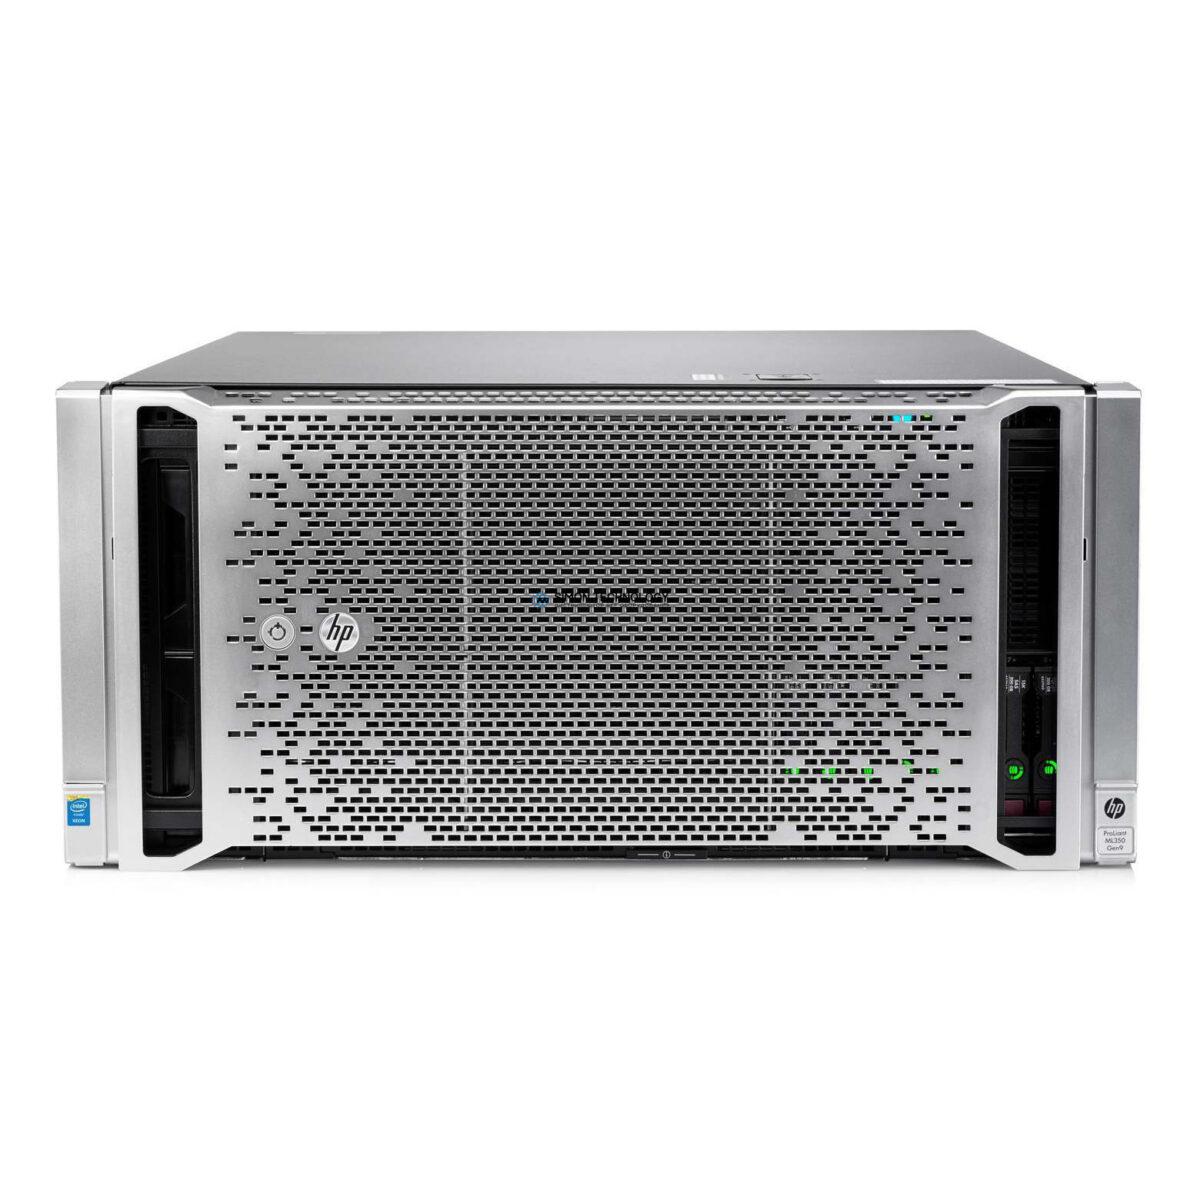 Сервер HP ML350 G9 RACK B140I 8*SFF CTO CHASSIS UPGRADED TO V4 DVD (ML350 G9 CTO RACK)